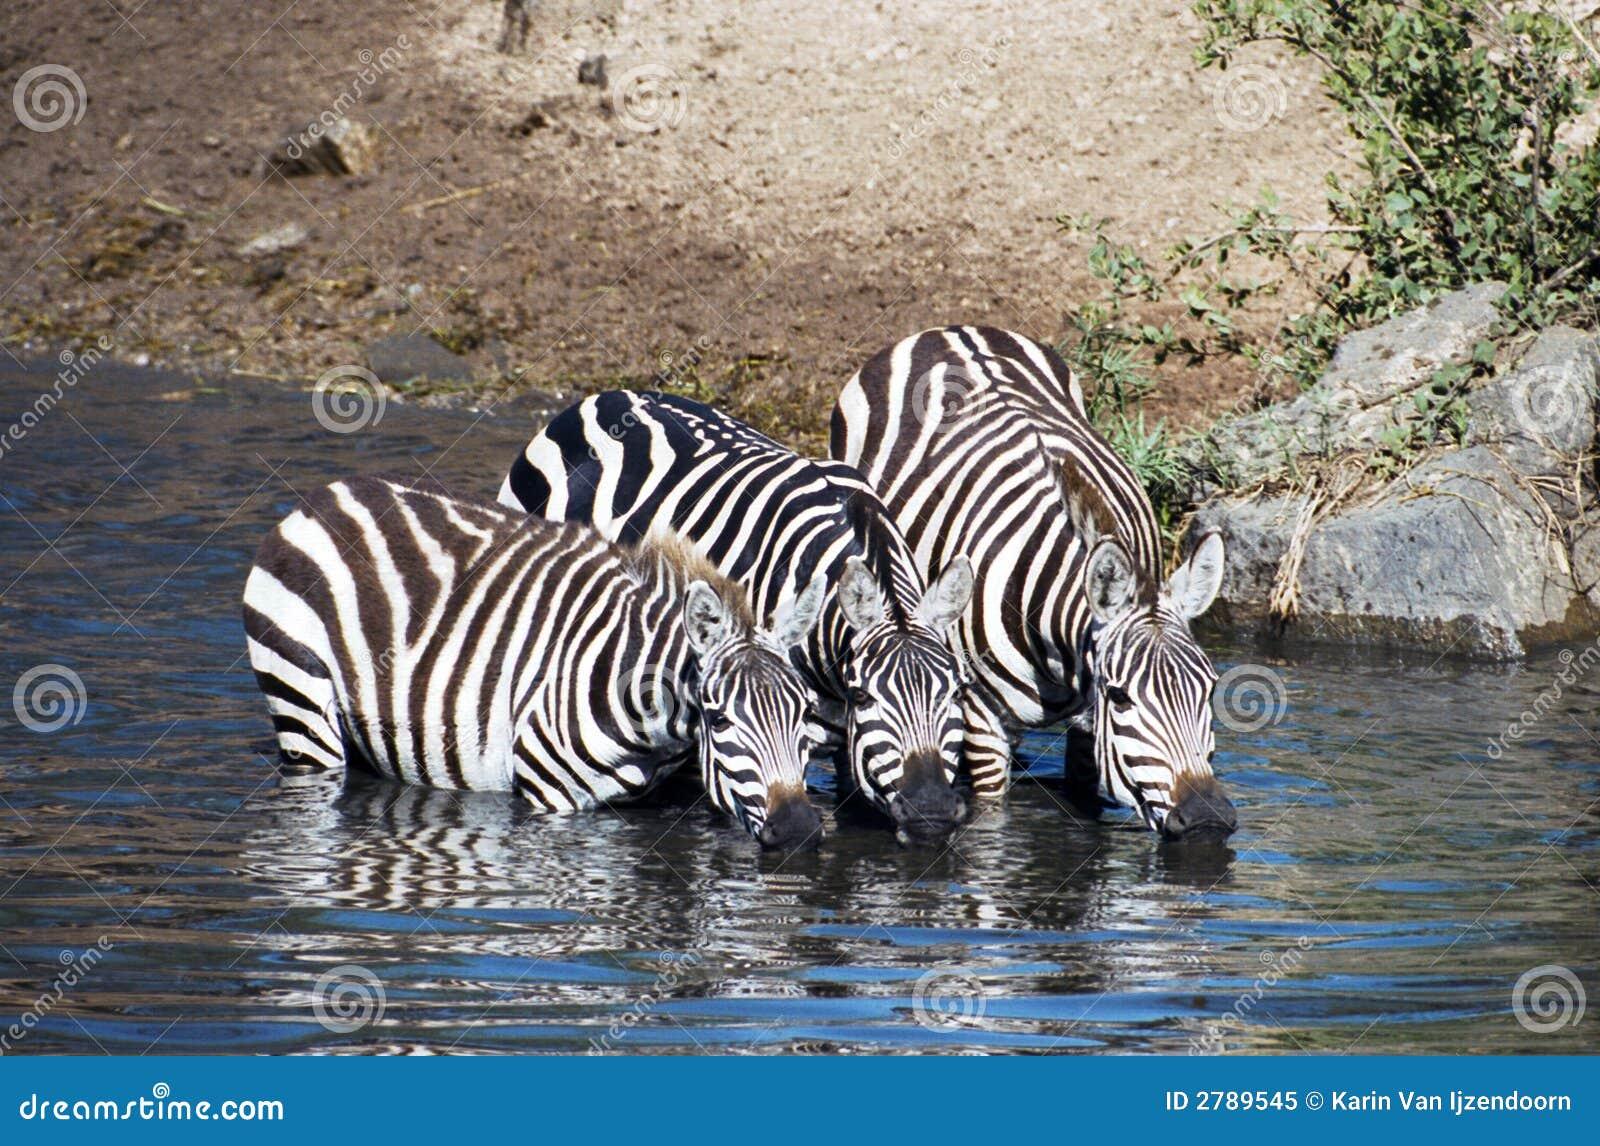 Zebra having a drink